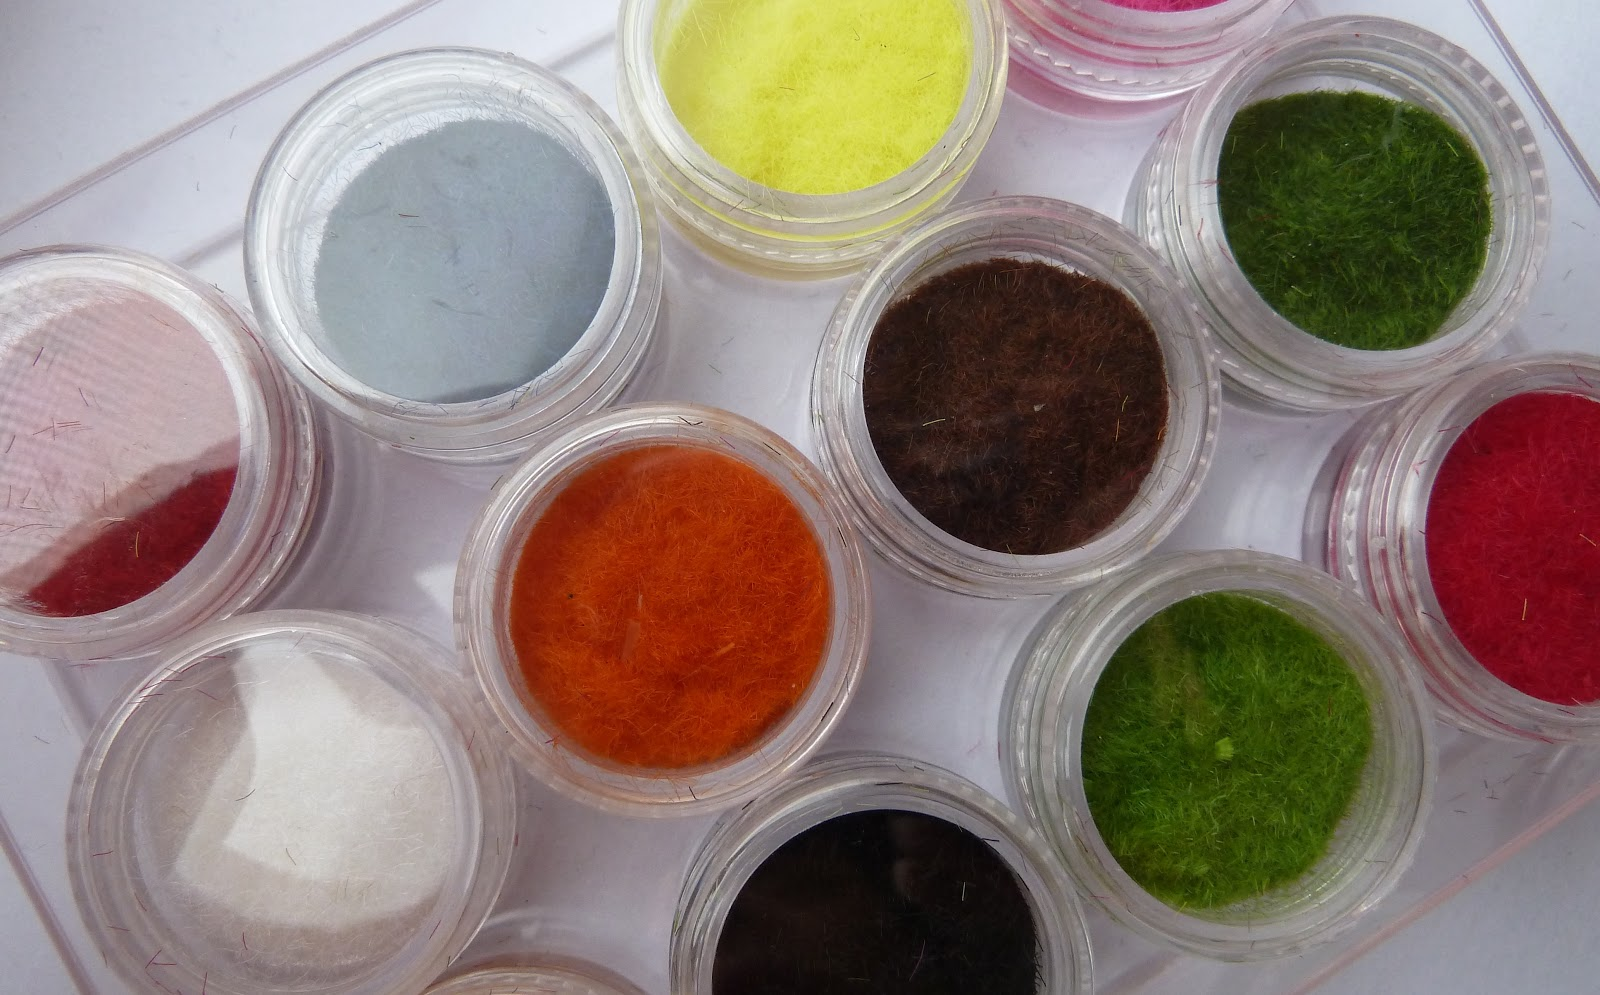 NailsByStephanie: Haul: My Ebay Nail Products Purchases